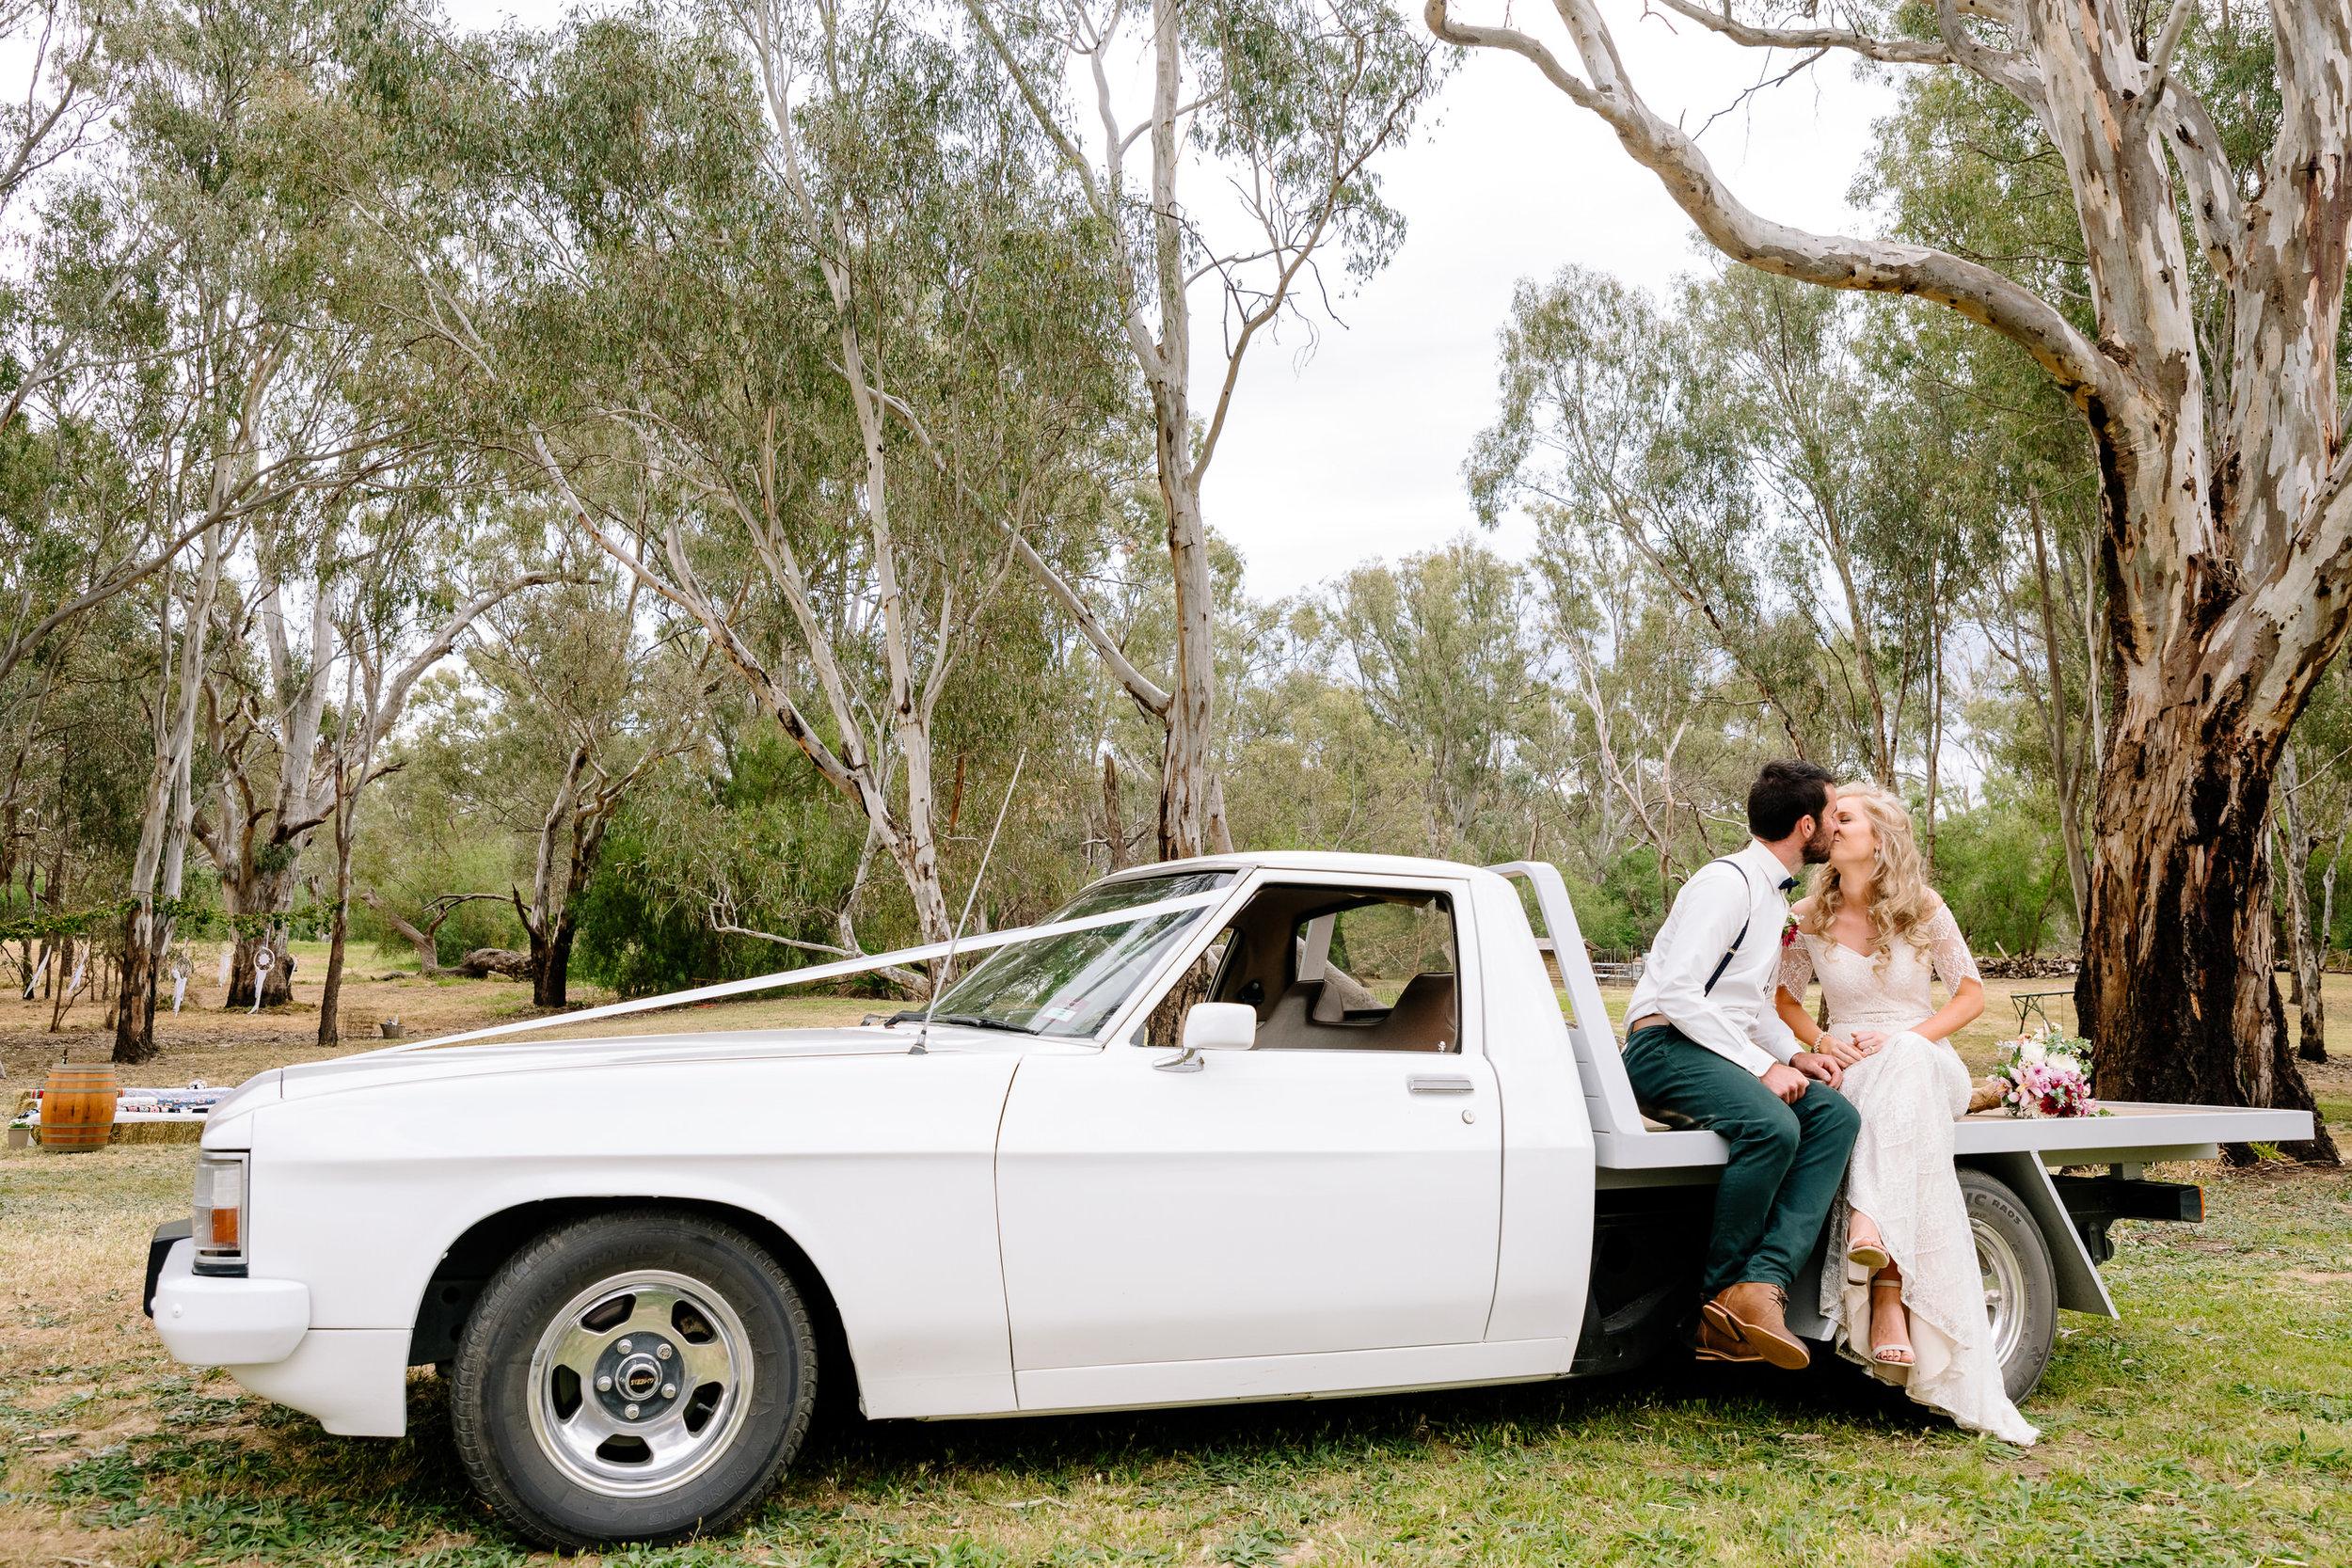 Justin_And_Jim_Photography_Backyard_Wedding189.JPG